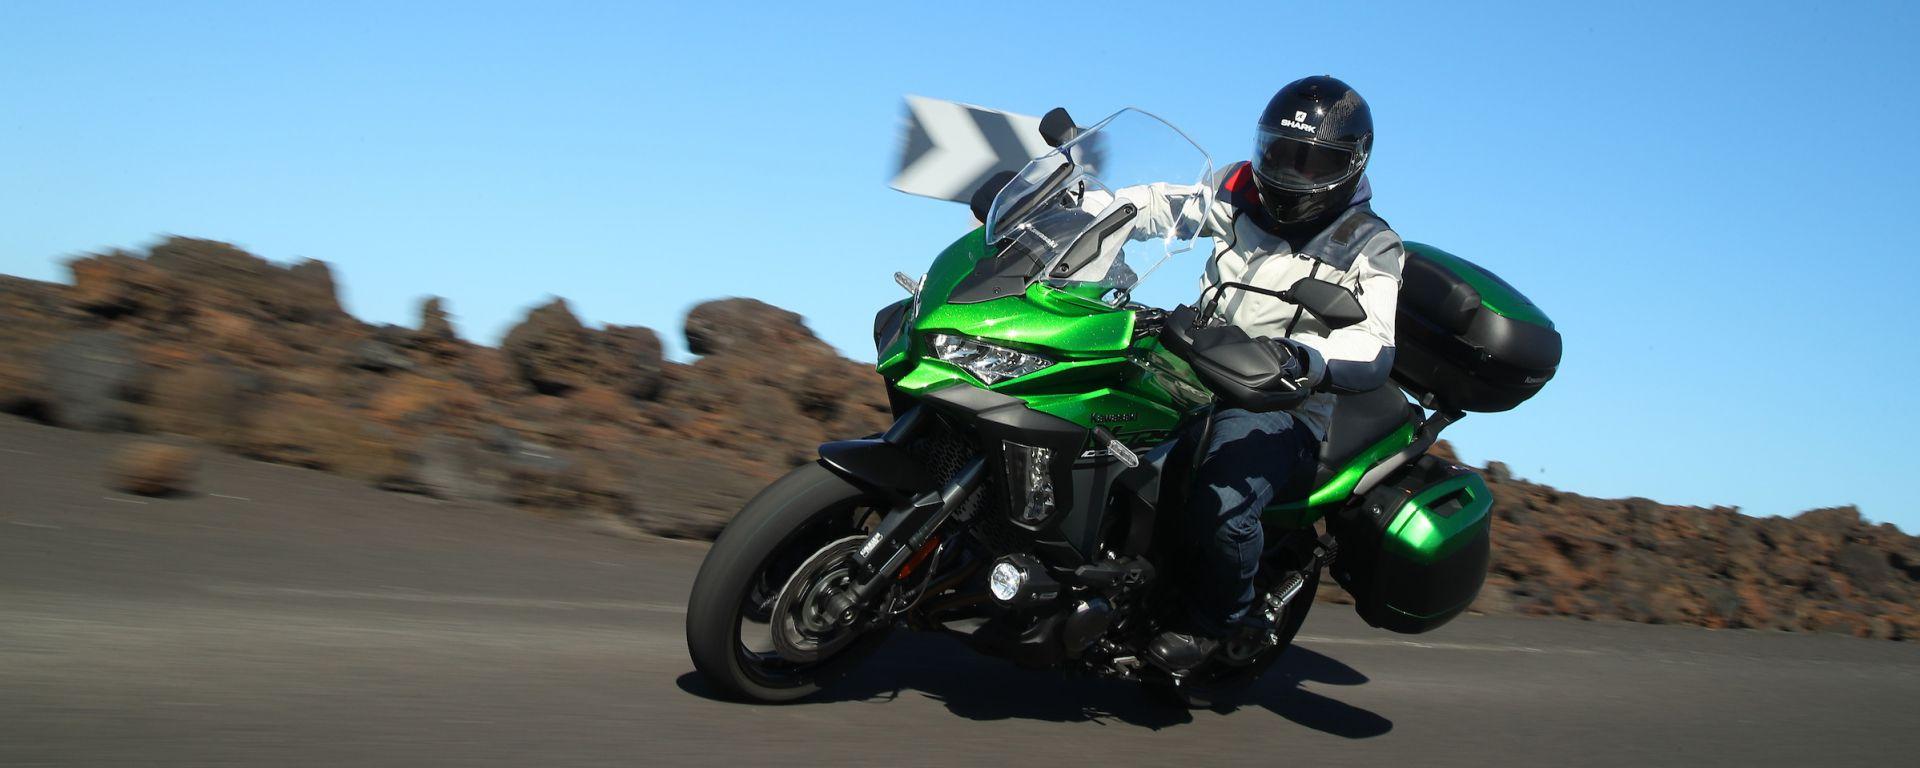 Kawasaki Versys 1000 2019: le opinioni dopo la prova su strada